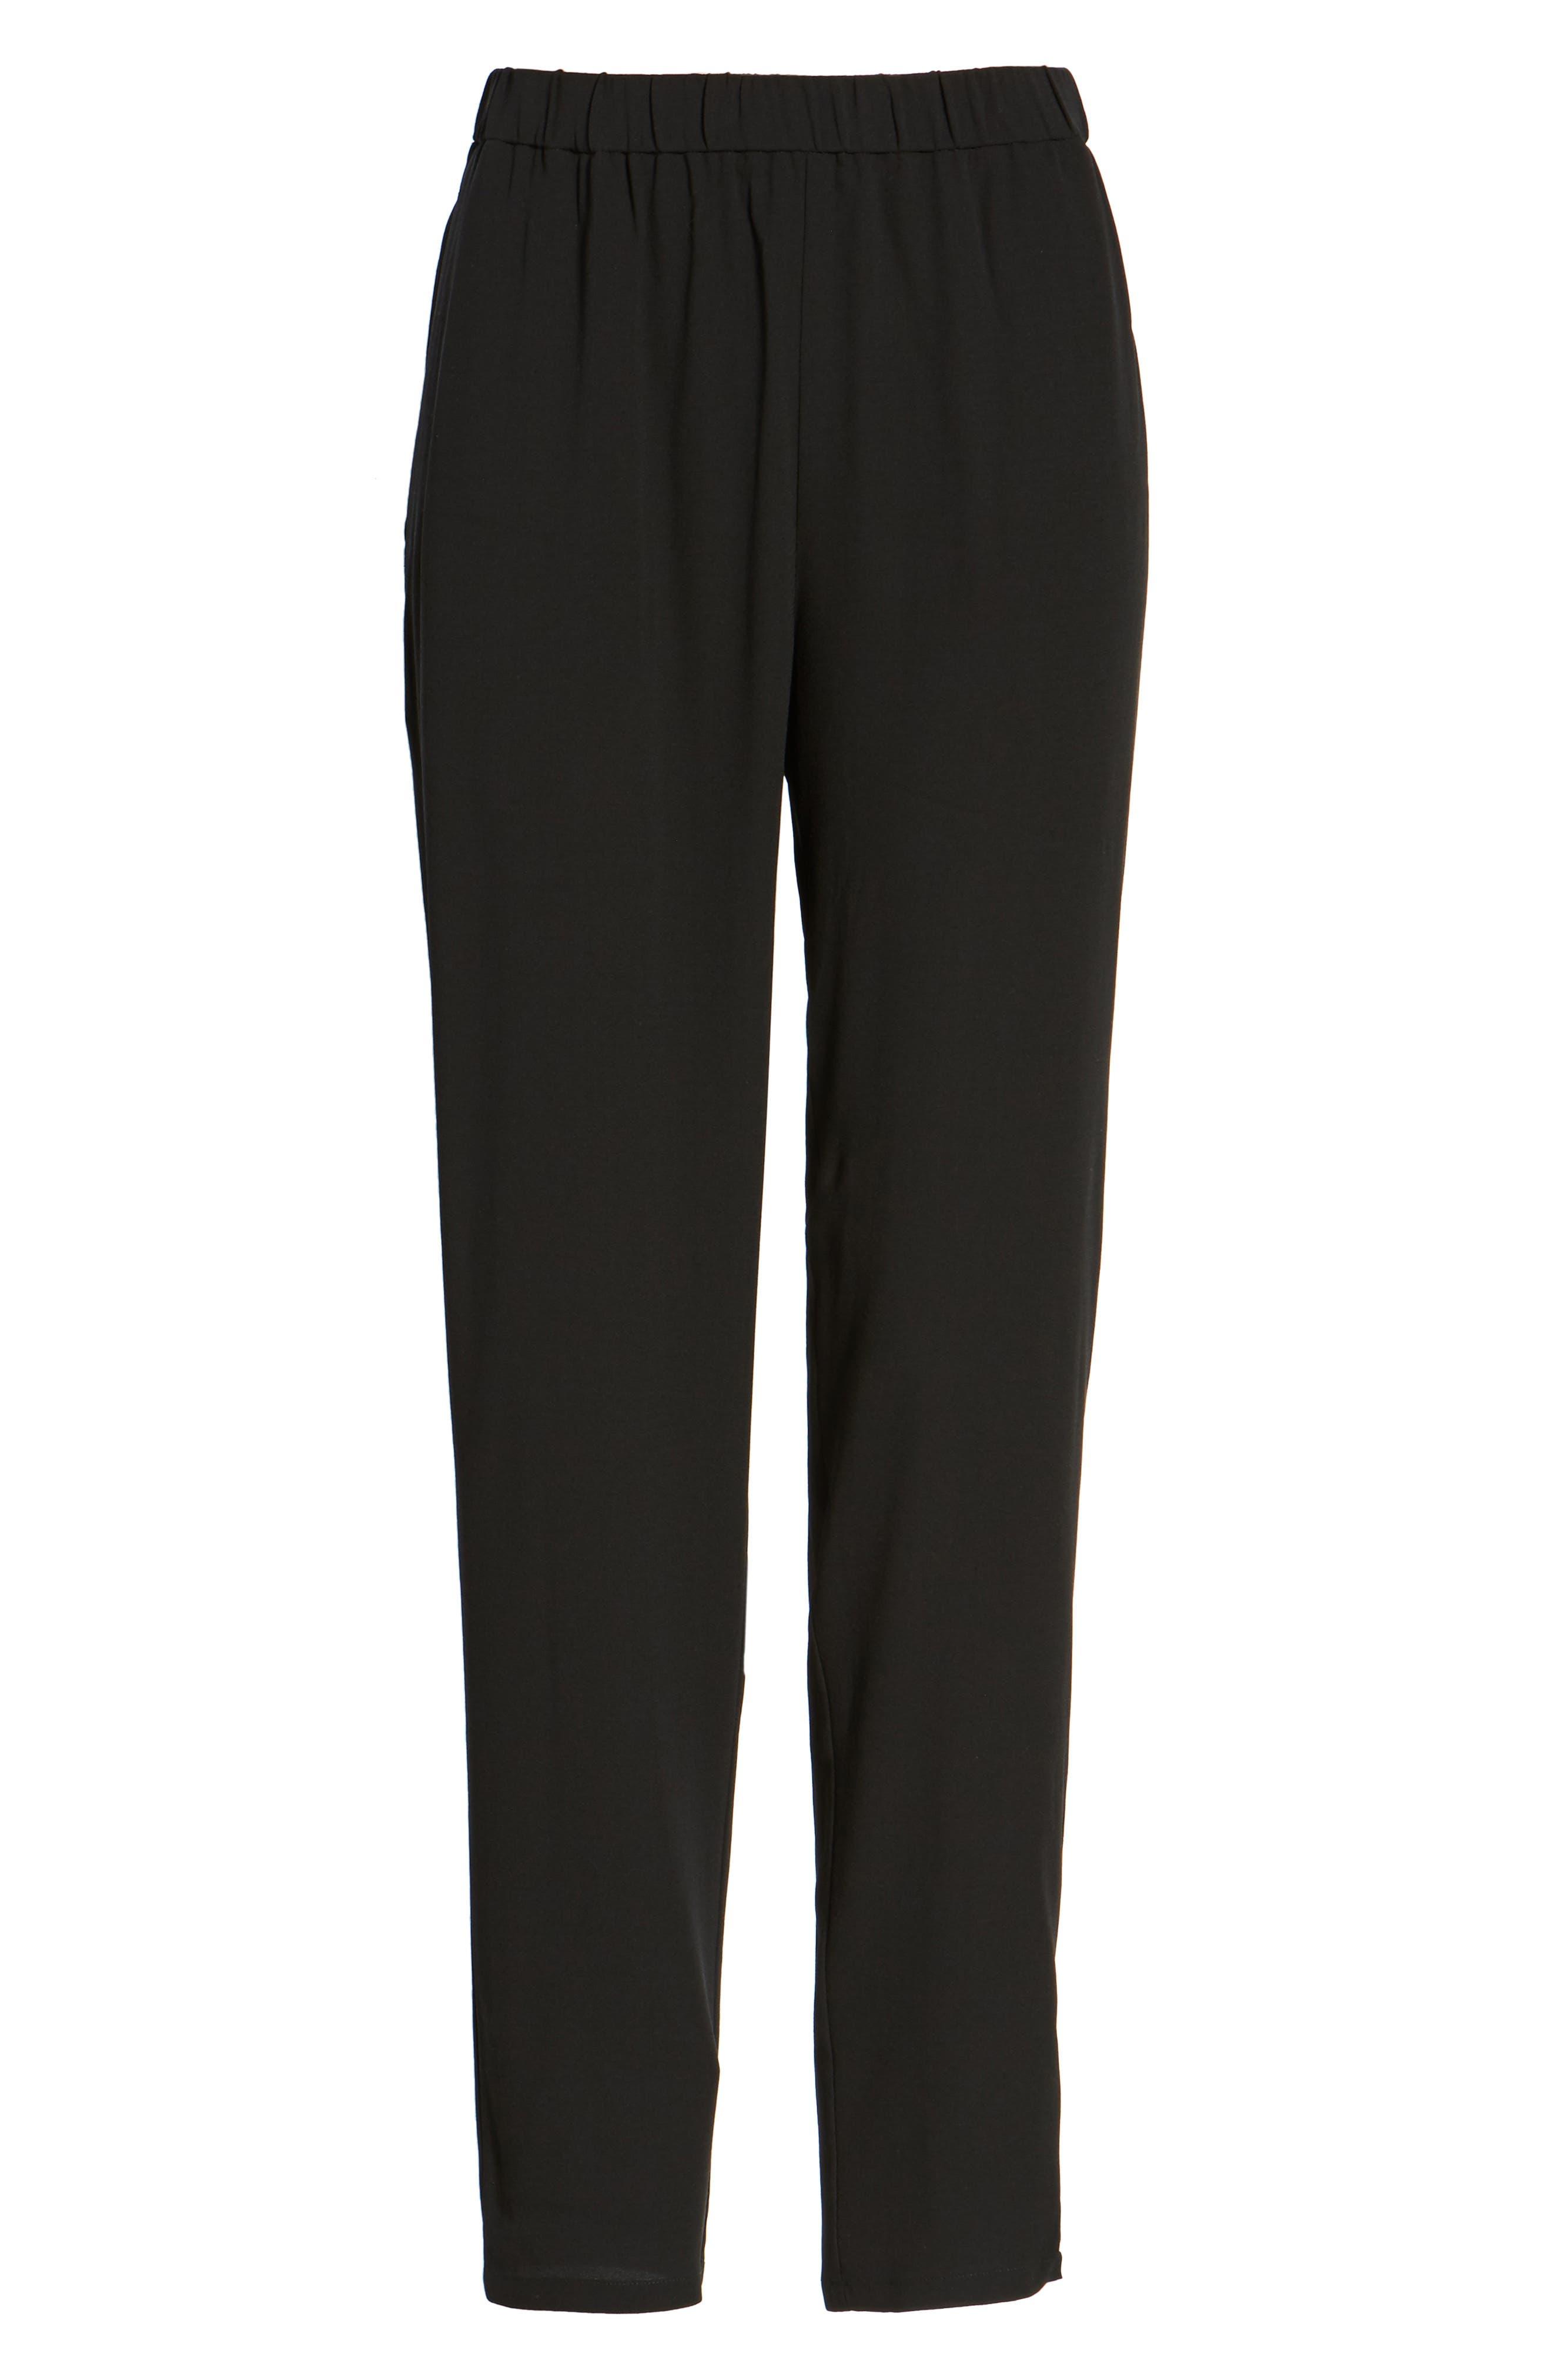 Slouchy Silk Crepe Ankle Pants,                             Alternate thumbnail 7, color,                             Black